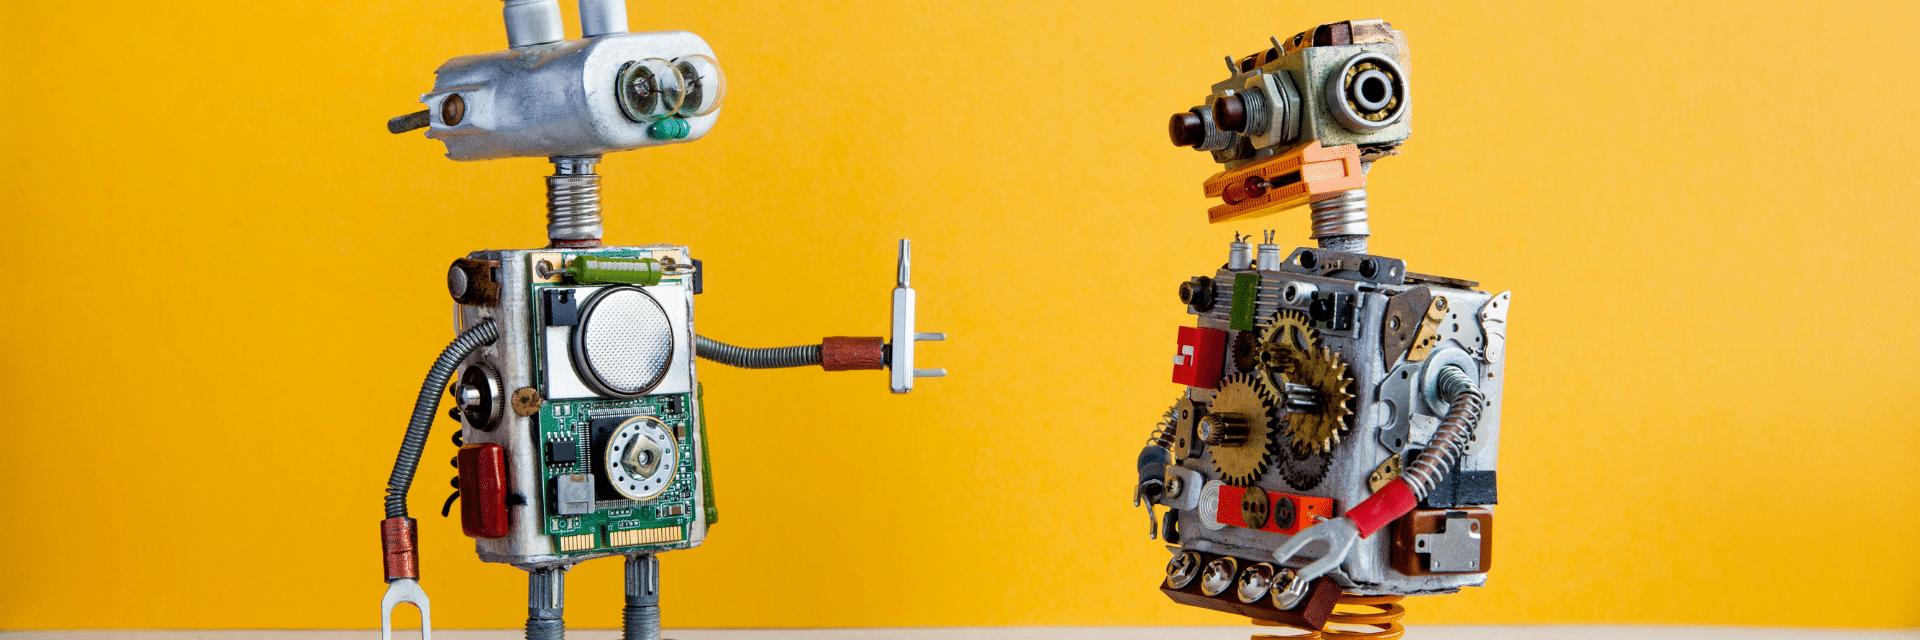 a robot passing another robot a tool